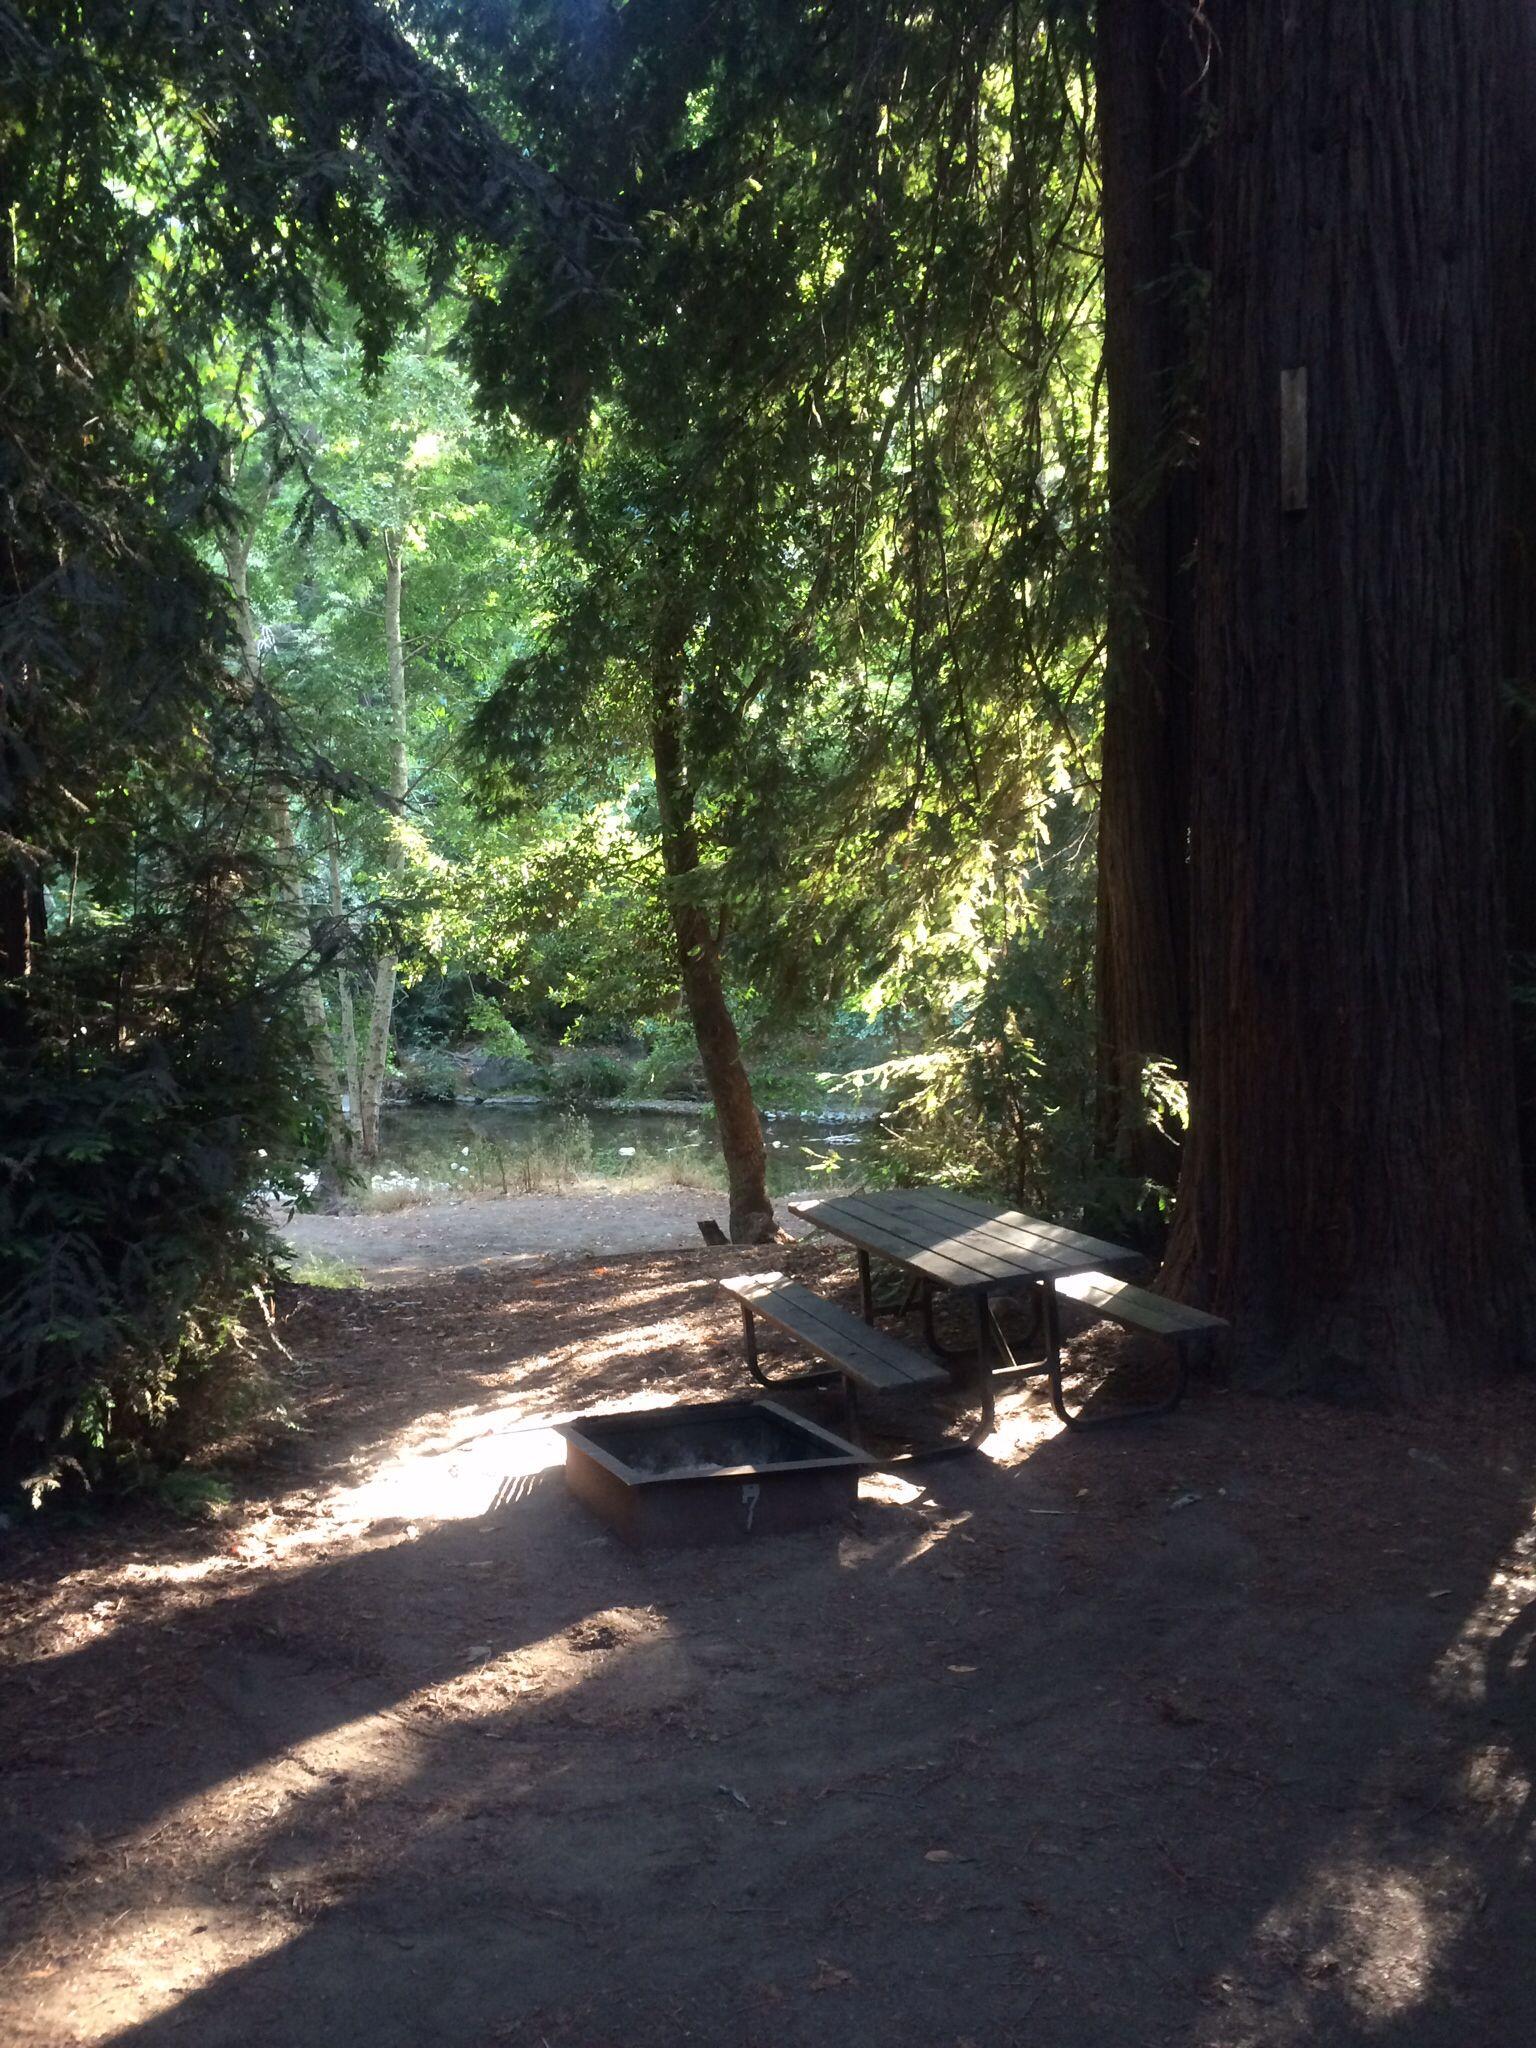 fernwood campground big sur. | road trip in california coast